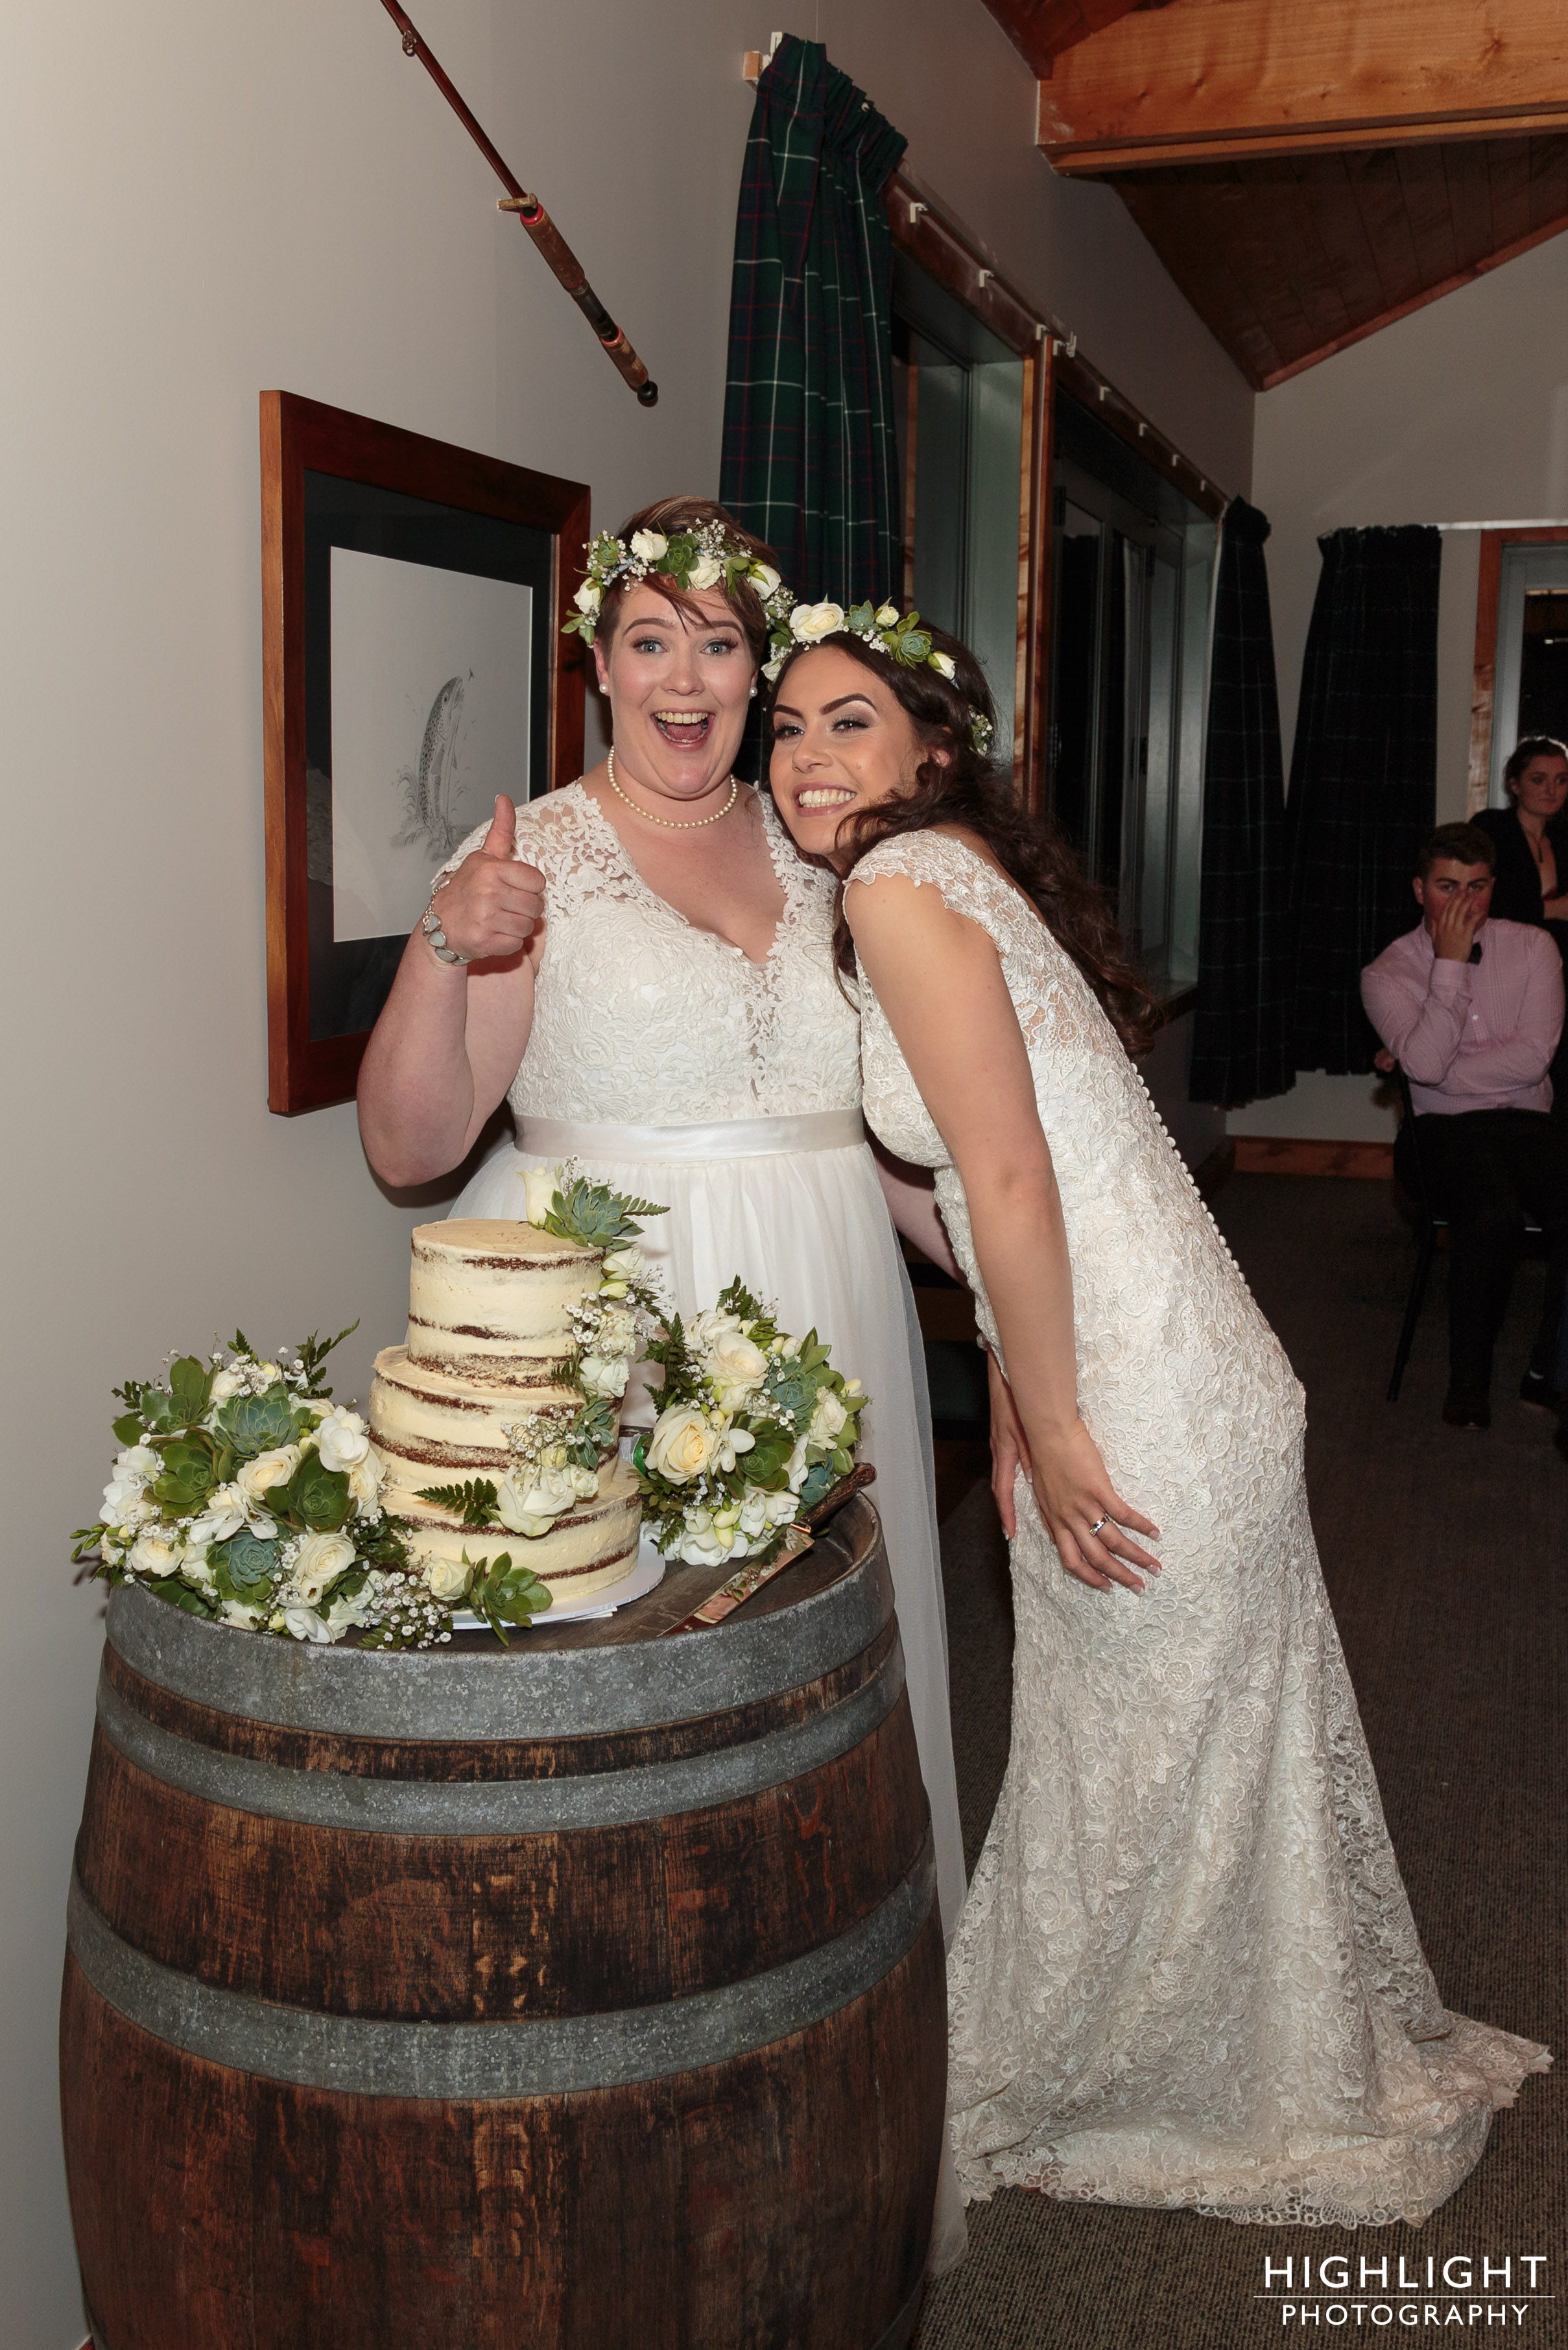 highlight_wedding_photography_makoura_lodge_manawatu_new_zealand-145.jpg